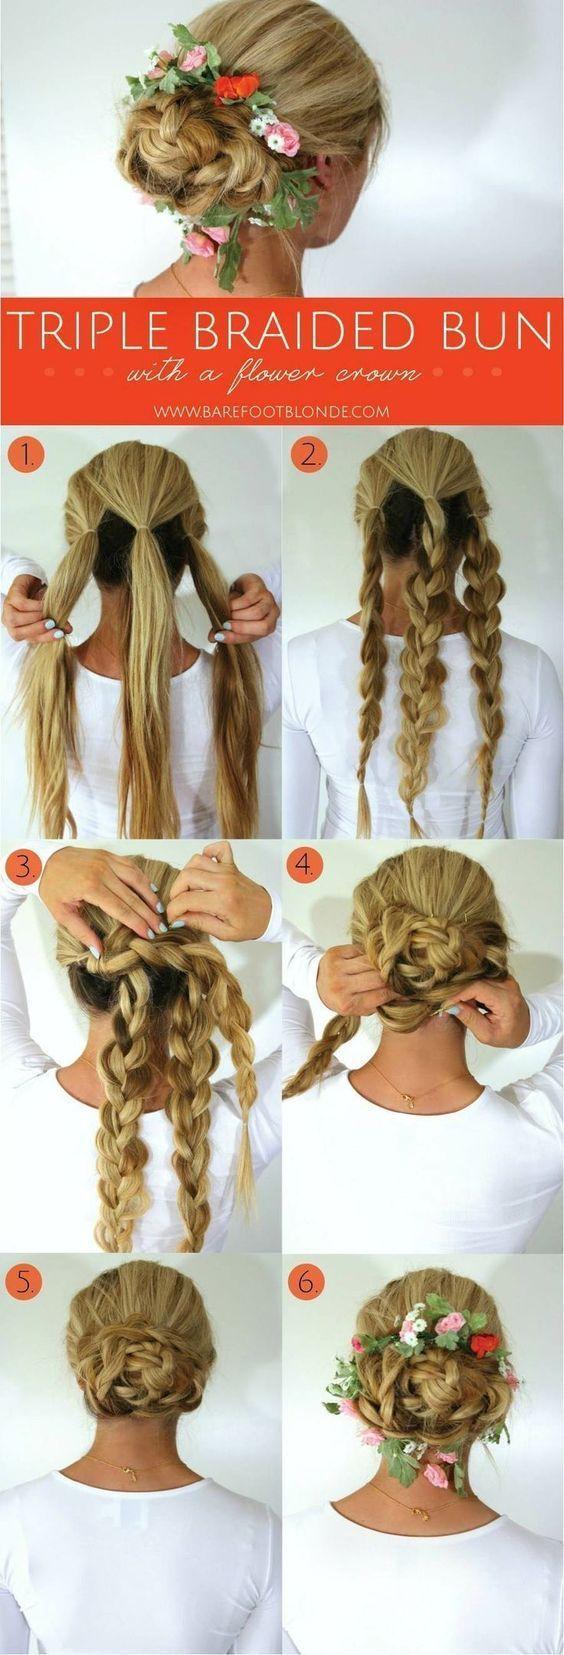 Terrific 1000 Ideas About Easy Work Hairstyles On Pinterest Work Short Hairstyles Gunalazisus